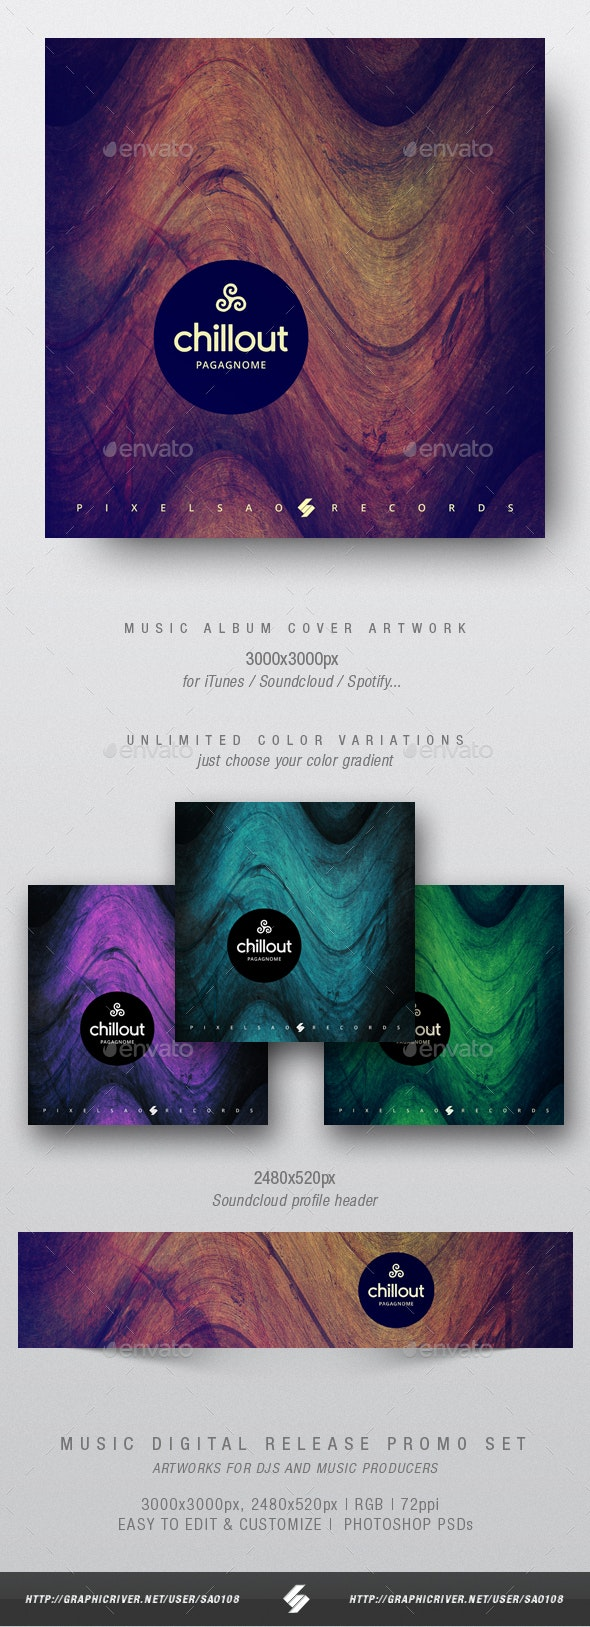 Chillout vol.2 - Music Album Cover Artwork Template - Miscellaneous Social Media